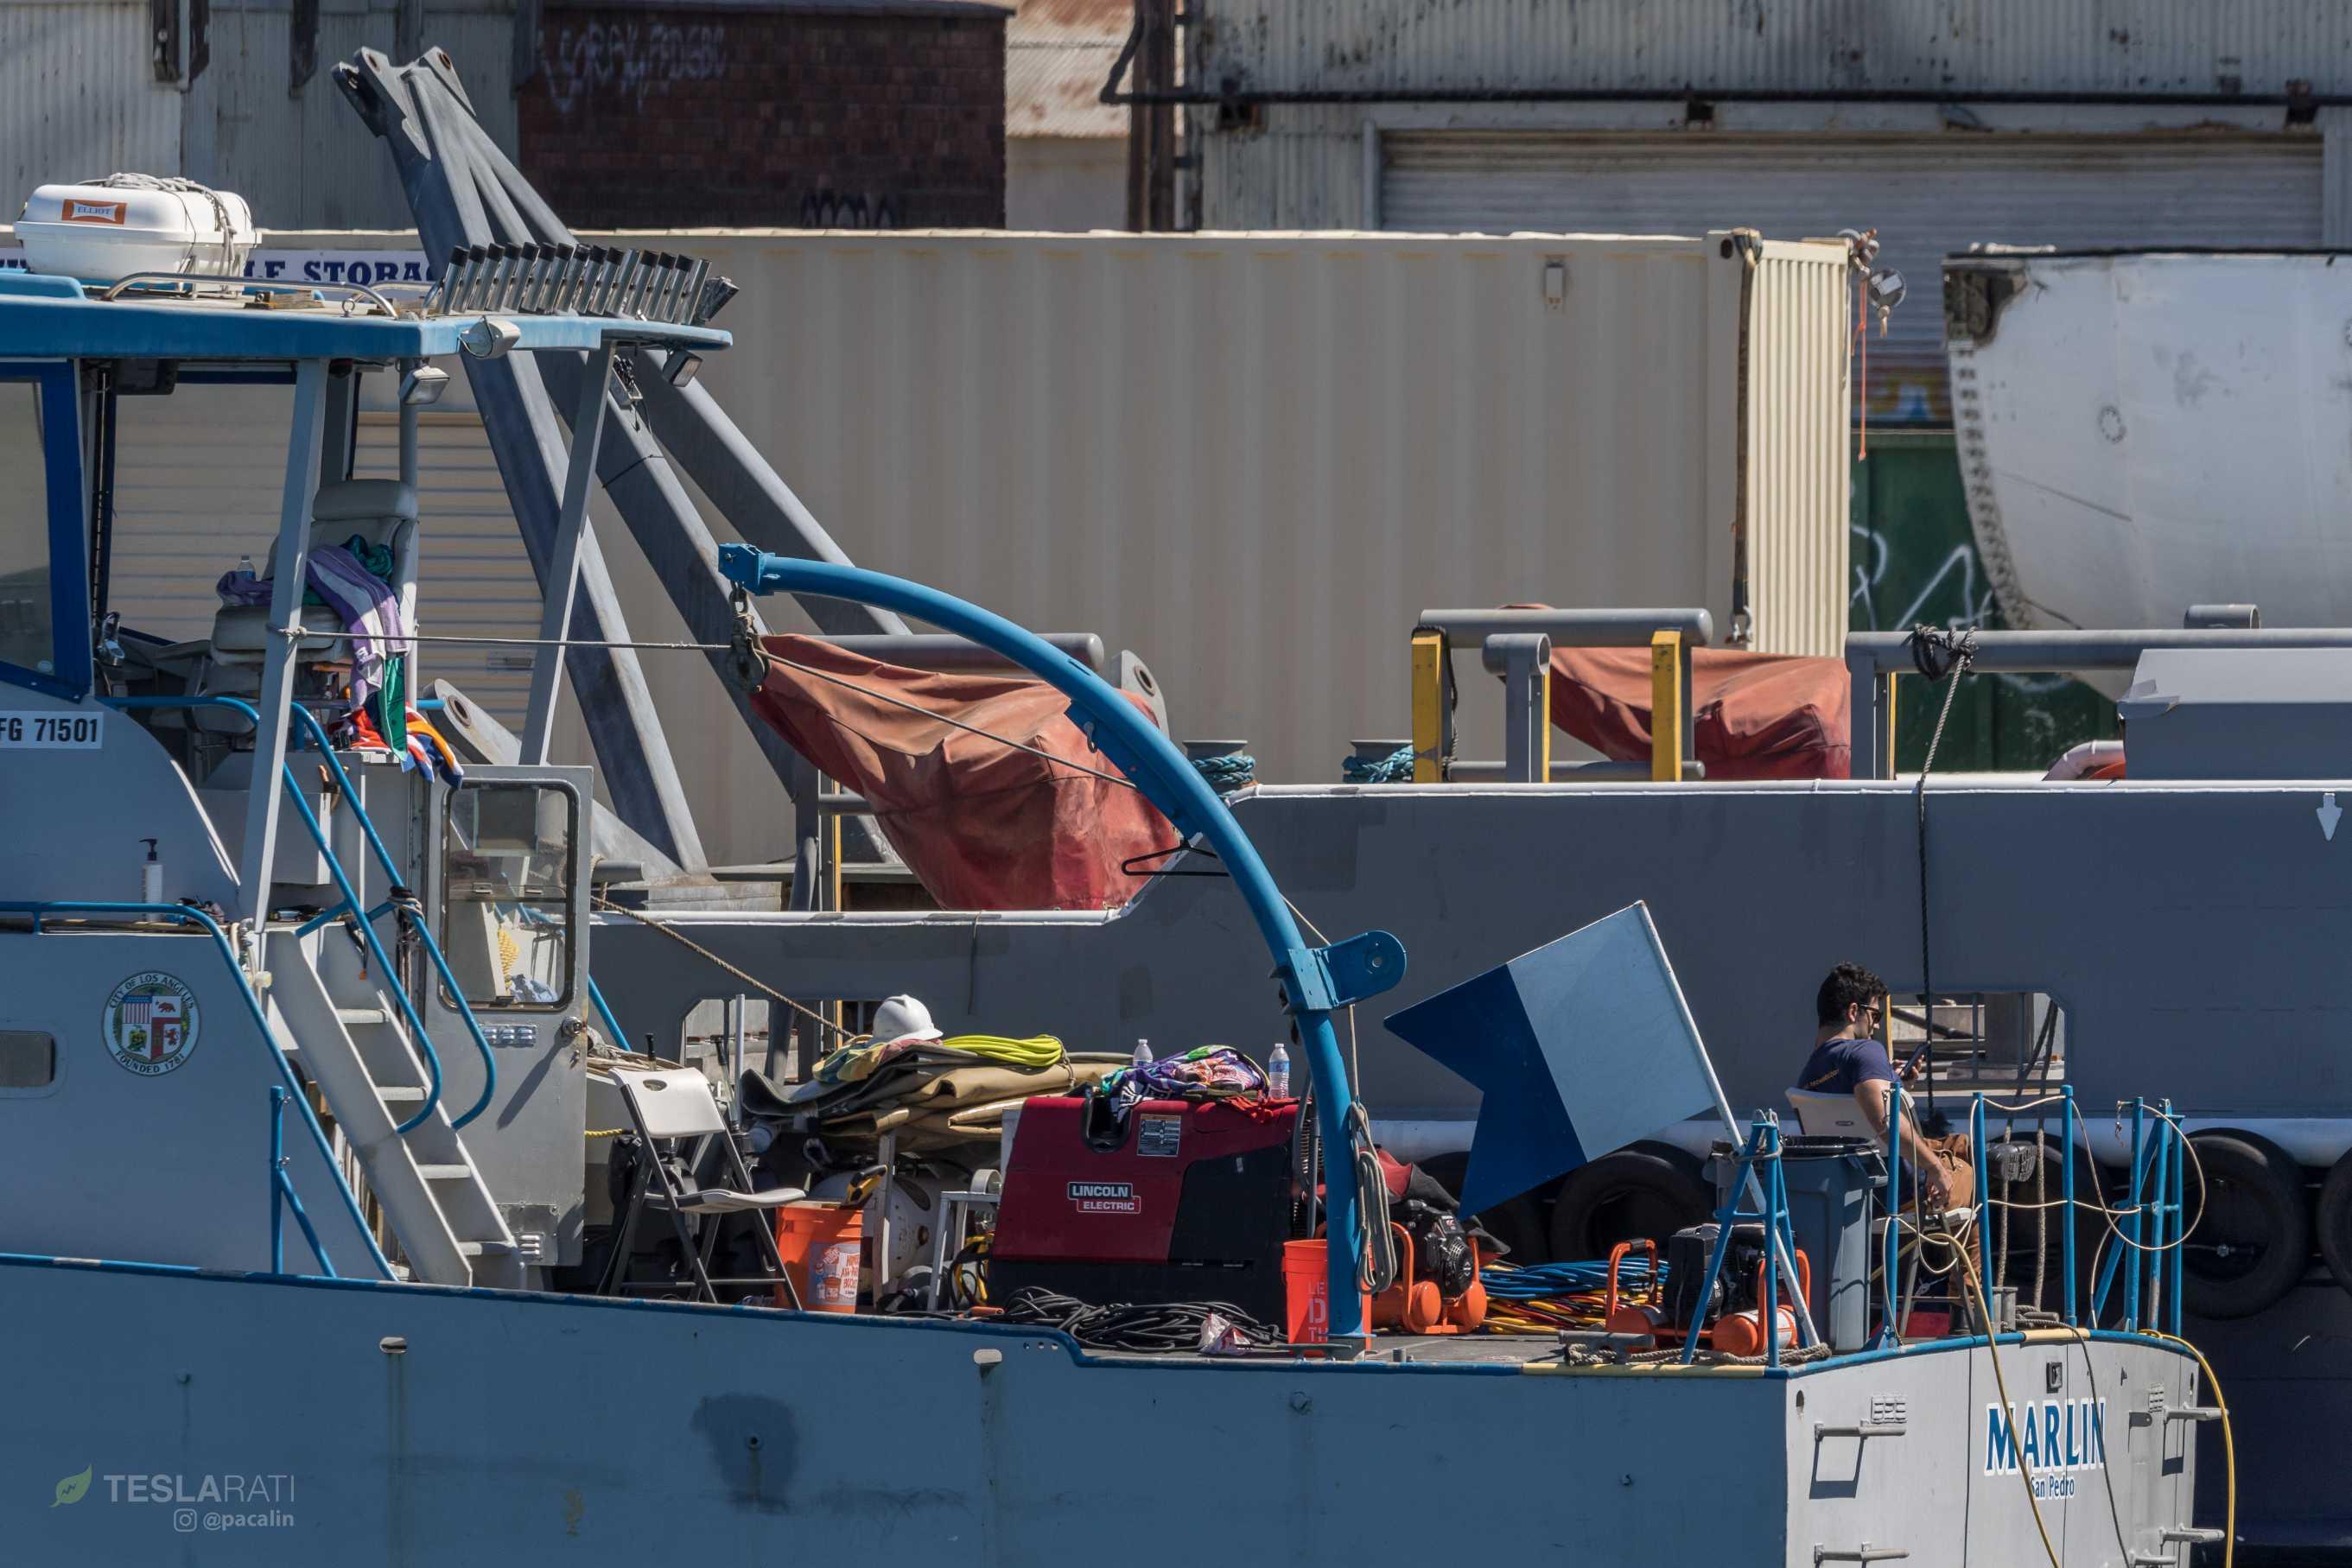 Berth 240 Marlin utility boat (Pauline Acalin)(c)